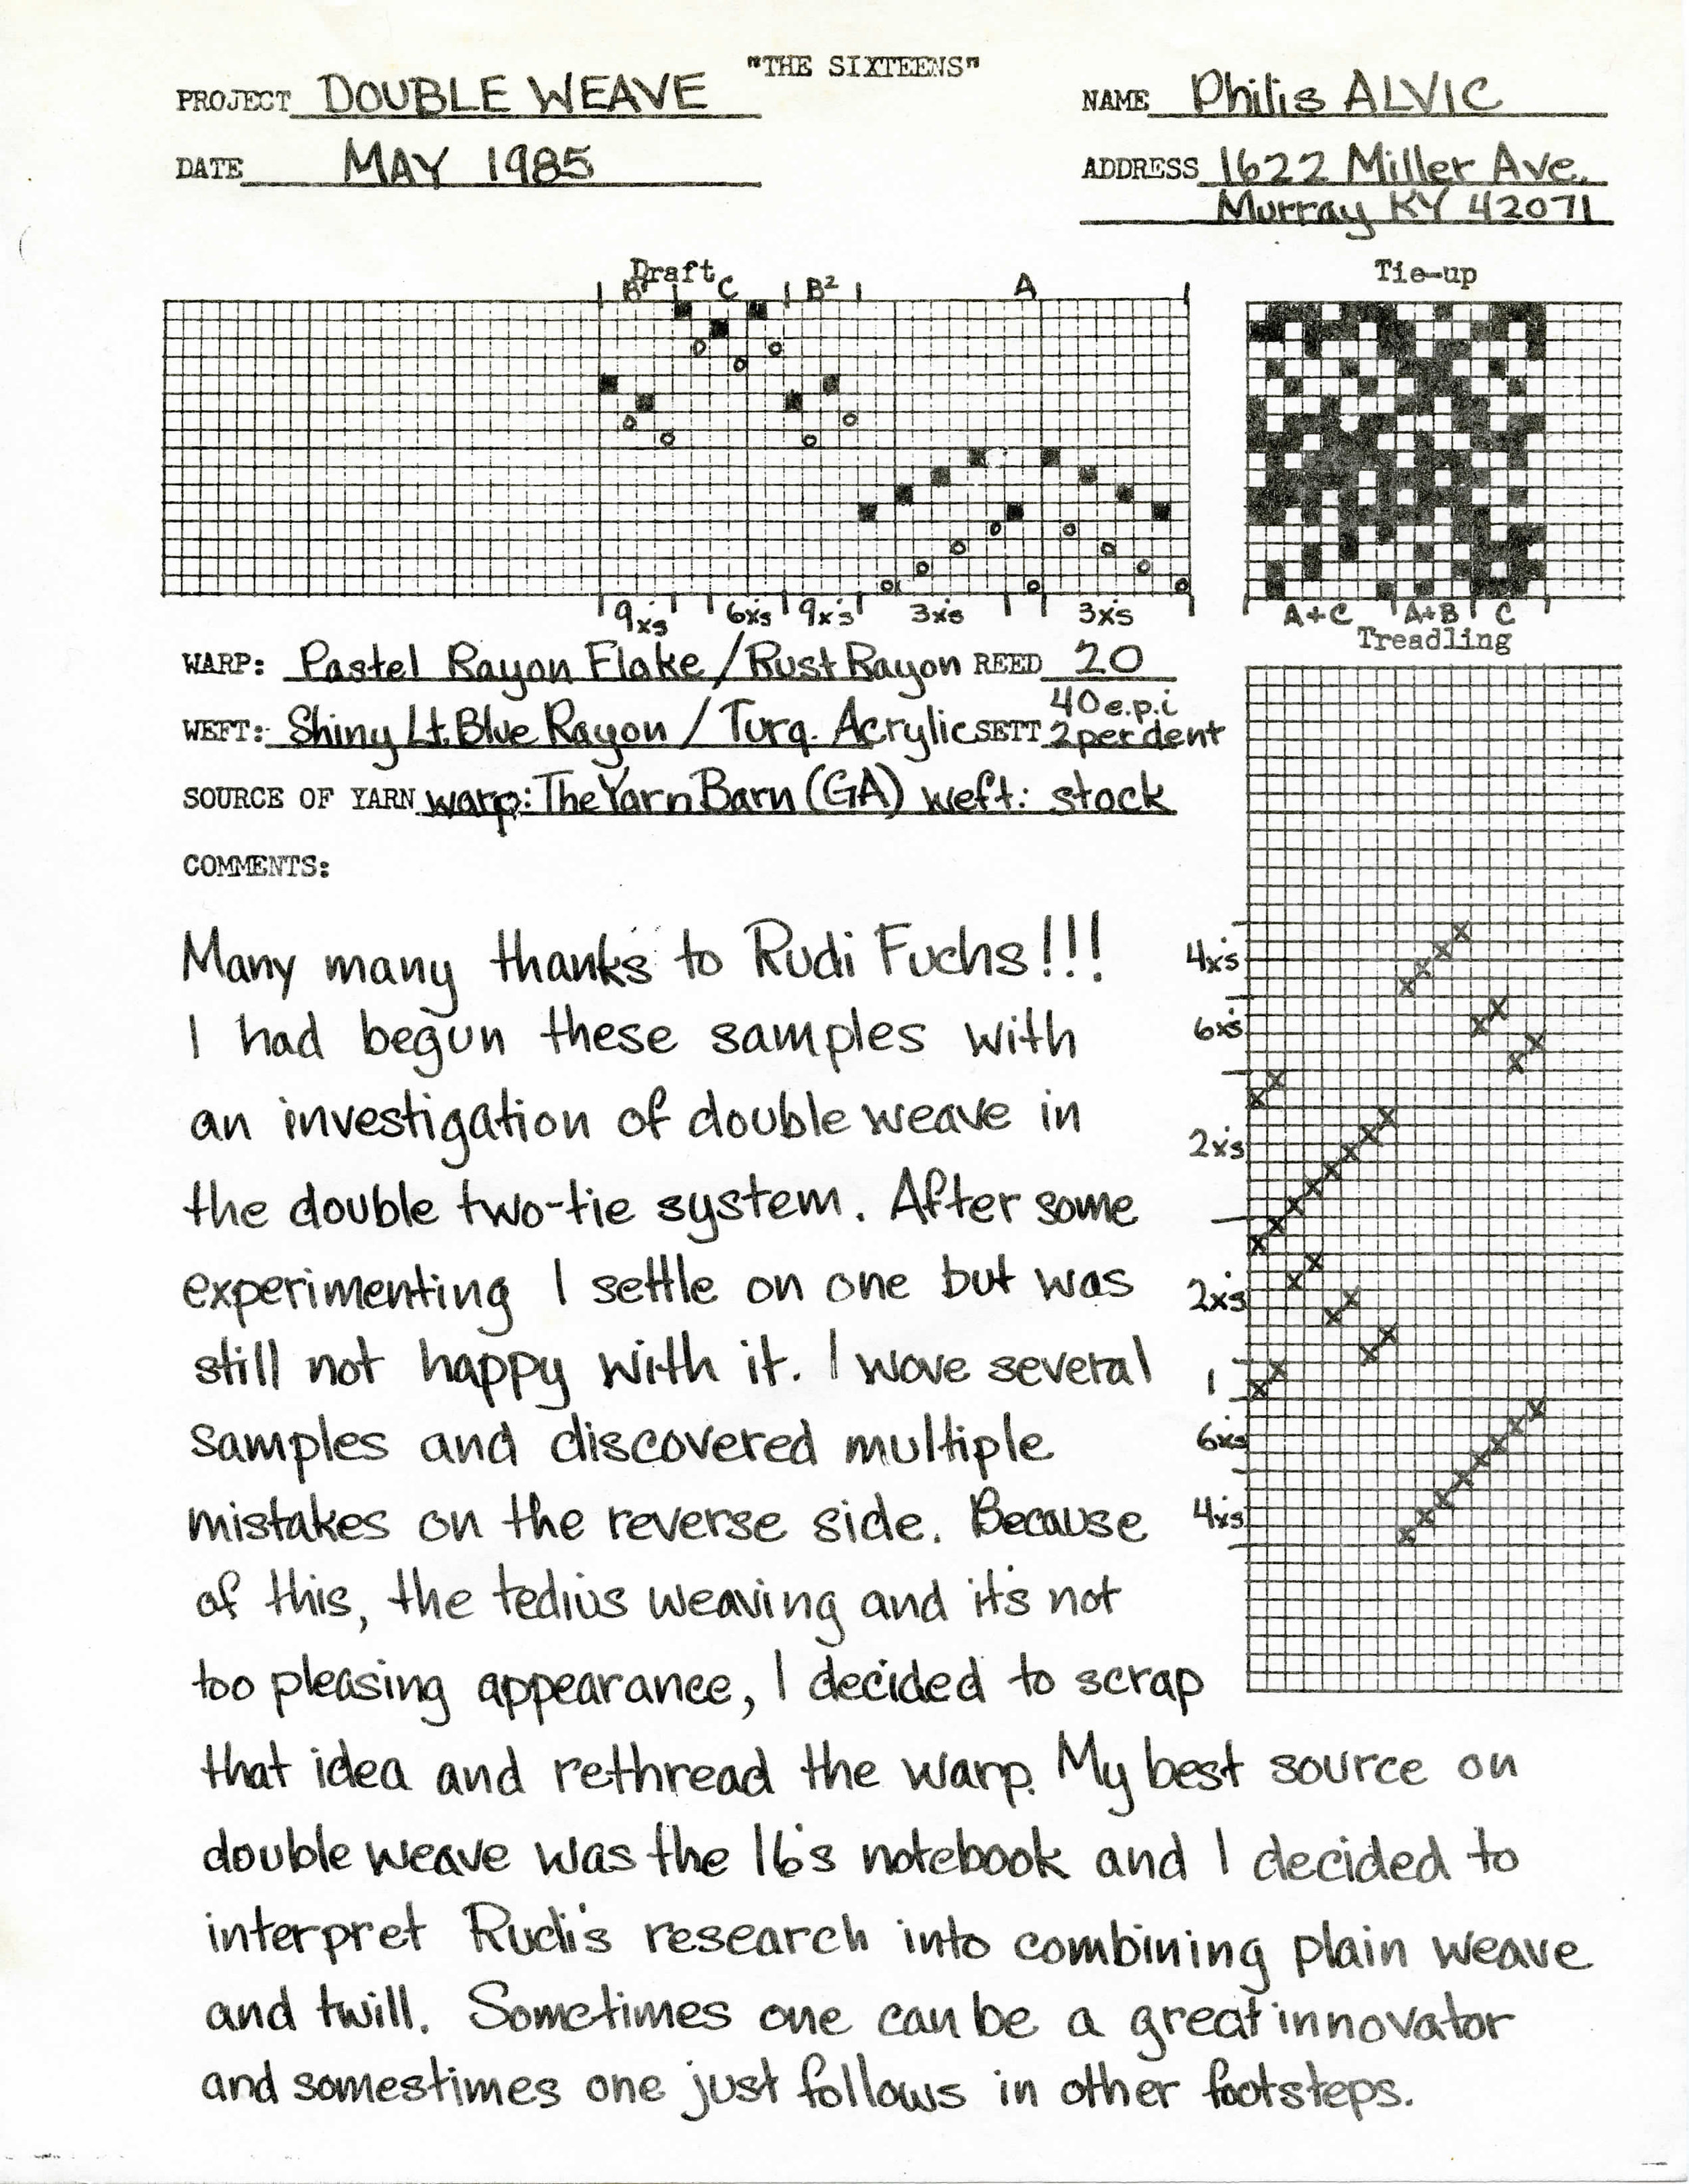 1985_Page_1_Image_0001.jpg